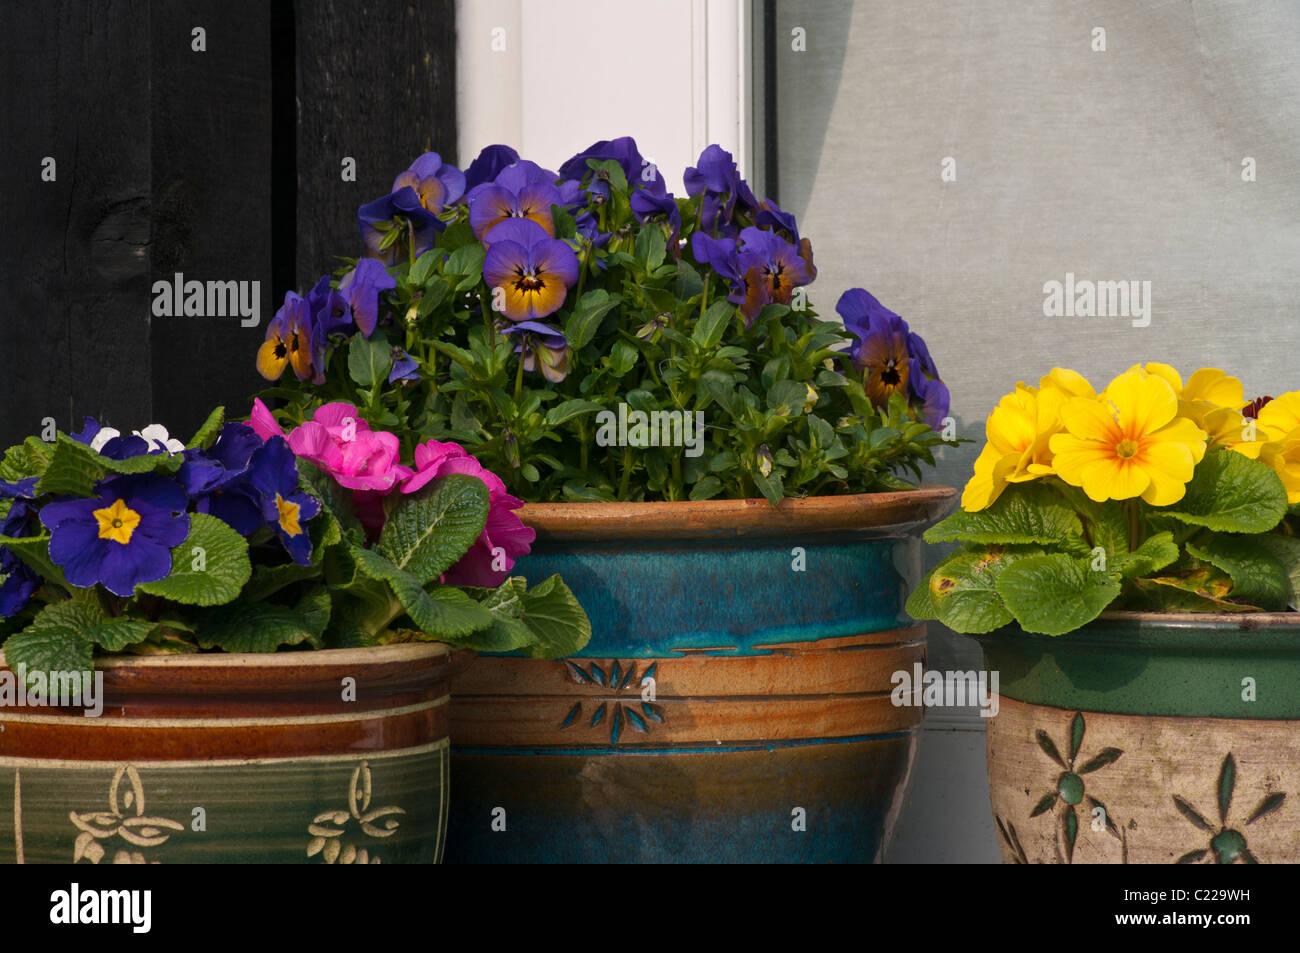 Bedding Plants In Decorative Garden Pots